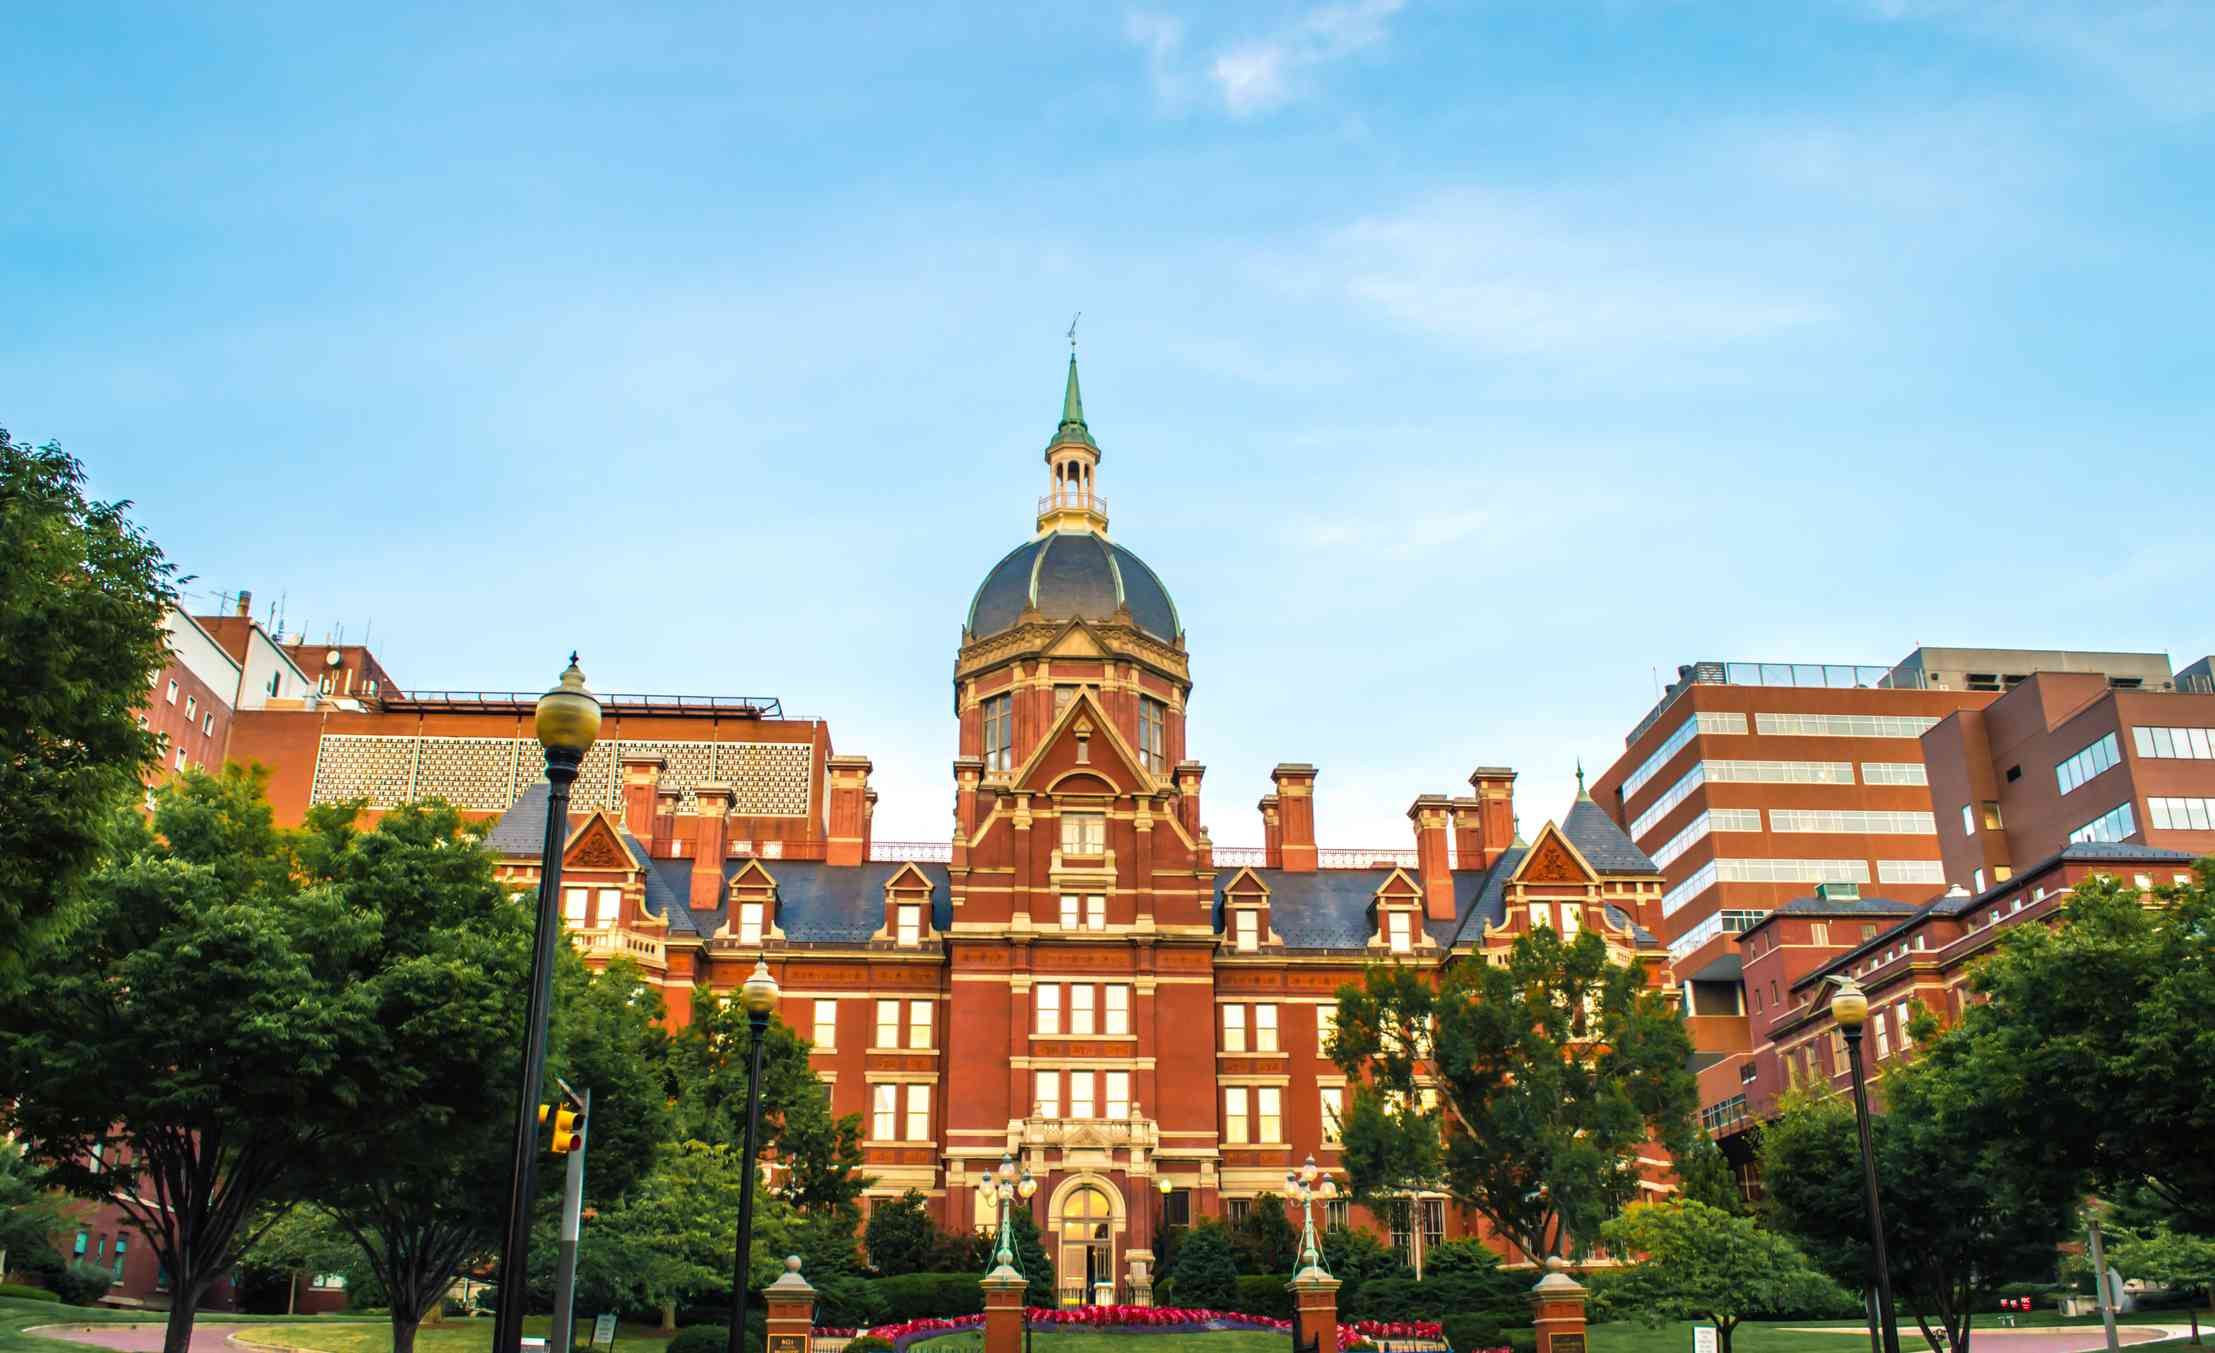 Facultad de Medicina de la Universidad Johns Hopkins